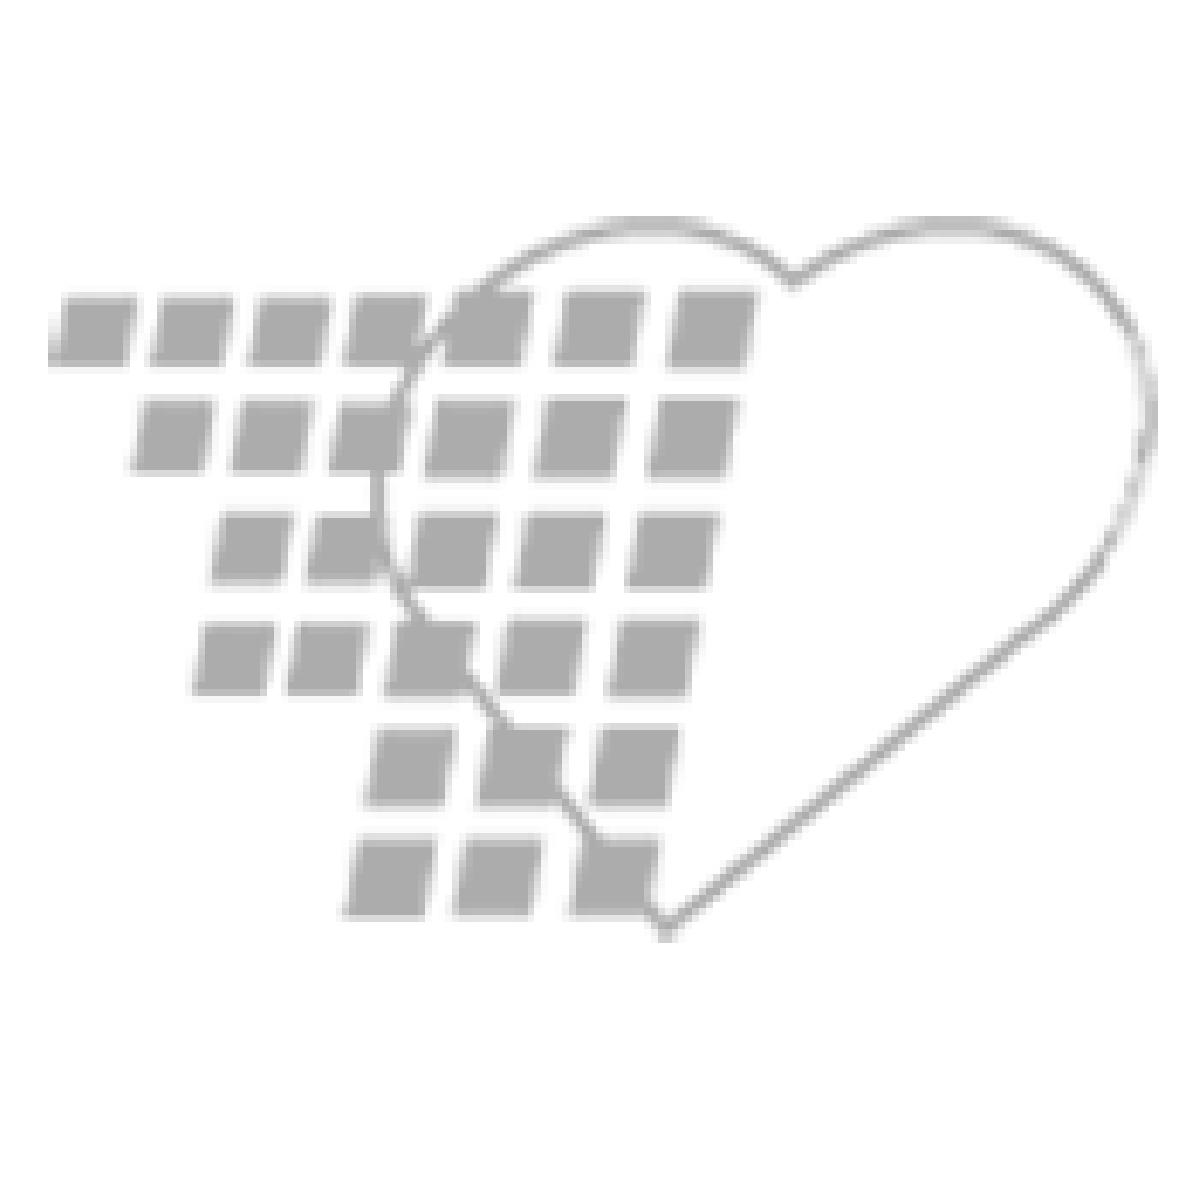 06-93-7515 Demo Dose® Ibuprofn Oral Syringes Repackaging Kit